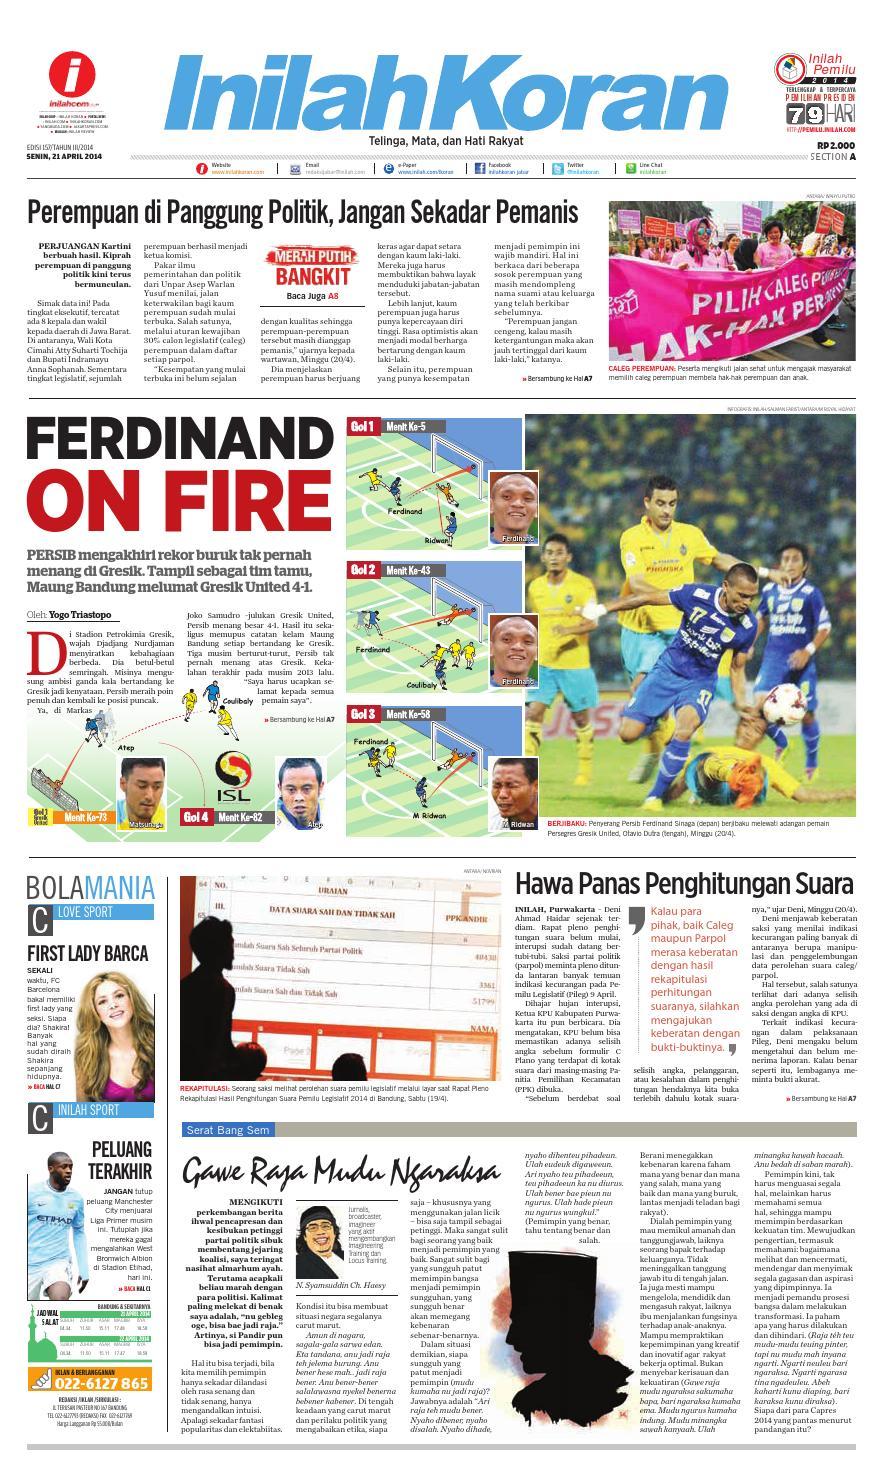 Ferdinand On Fire By Inilah Koran Issuu Produk Ukm Bumn Shifudo Bakso Ikan 500g Free Ongkir Depok Ampamp Jakarta